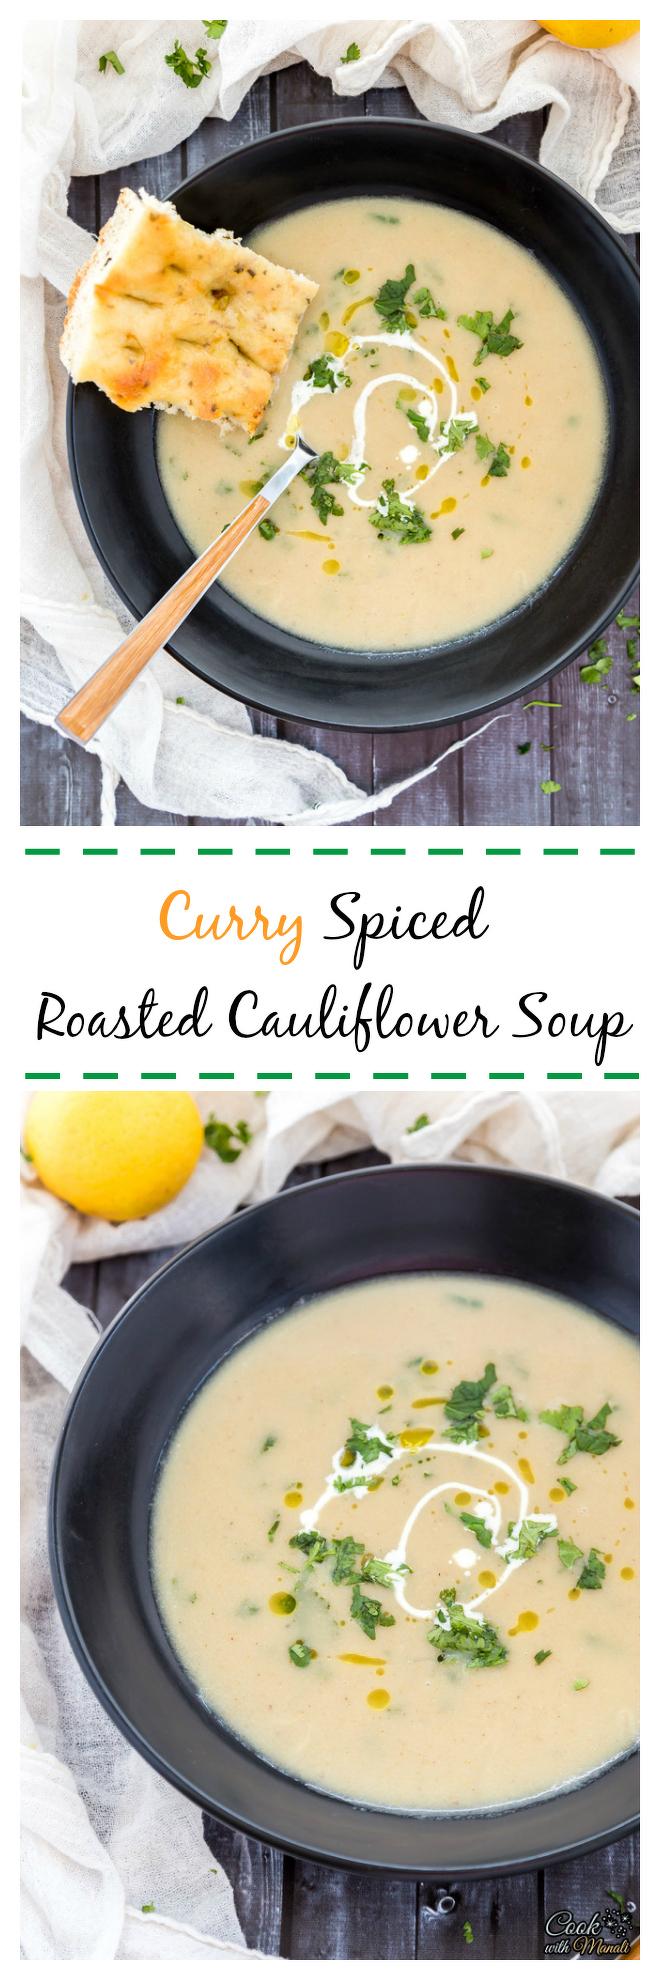 Roasted Cauliflower Soup Collage-nocwm